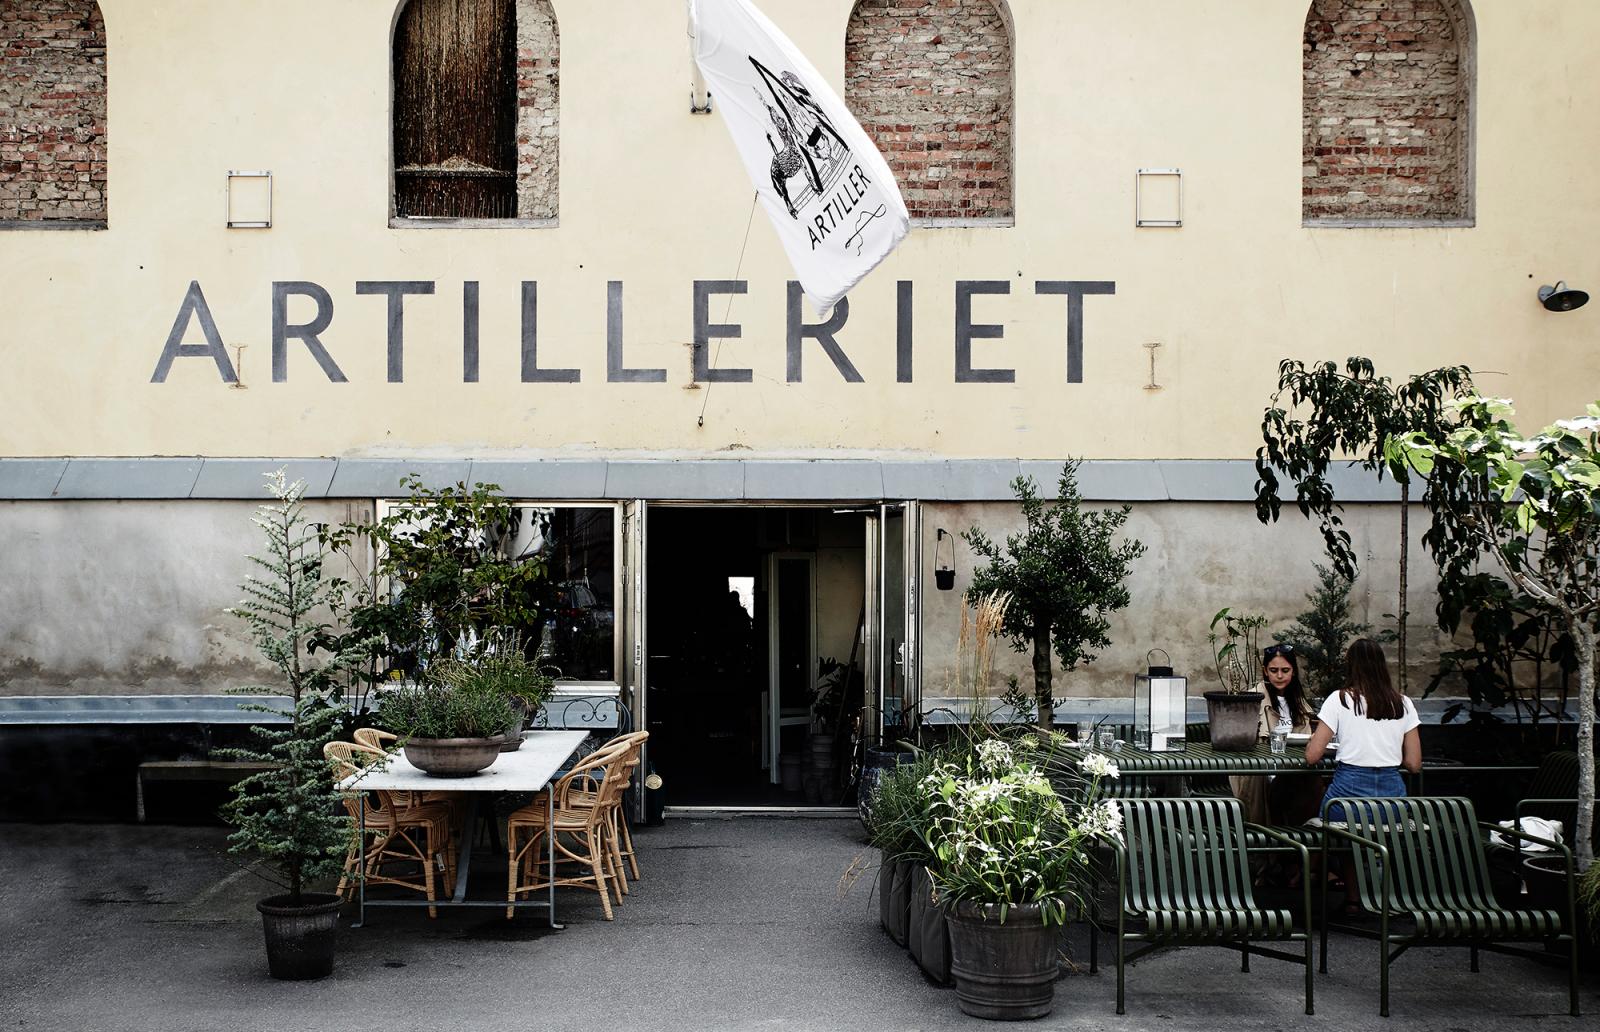 ARTILLERIET  Magasinsgatan 19 SE- 411 18 Göteborg  Opening hours:  Mon-Fri: 10-30–18 Saturday: 11–16 Sunday: 12–16  Tel: + 46 (0) 31-711 76 21  Mail: info (@) artilleriet.se